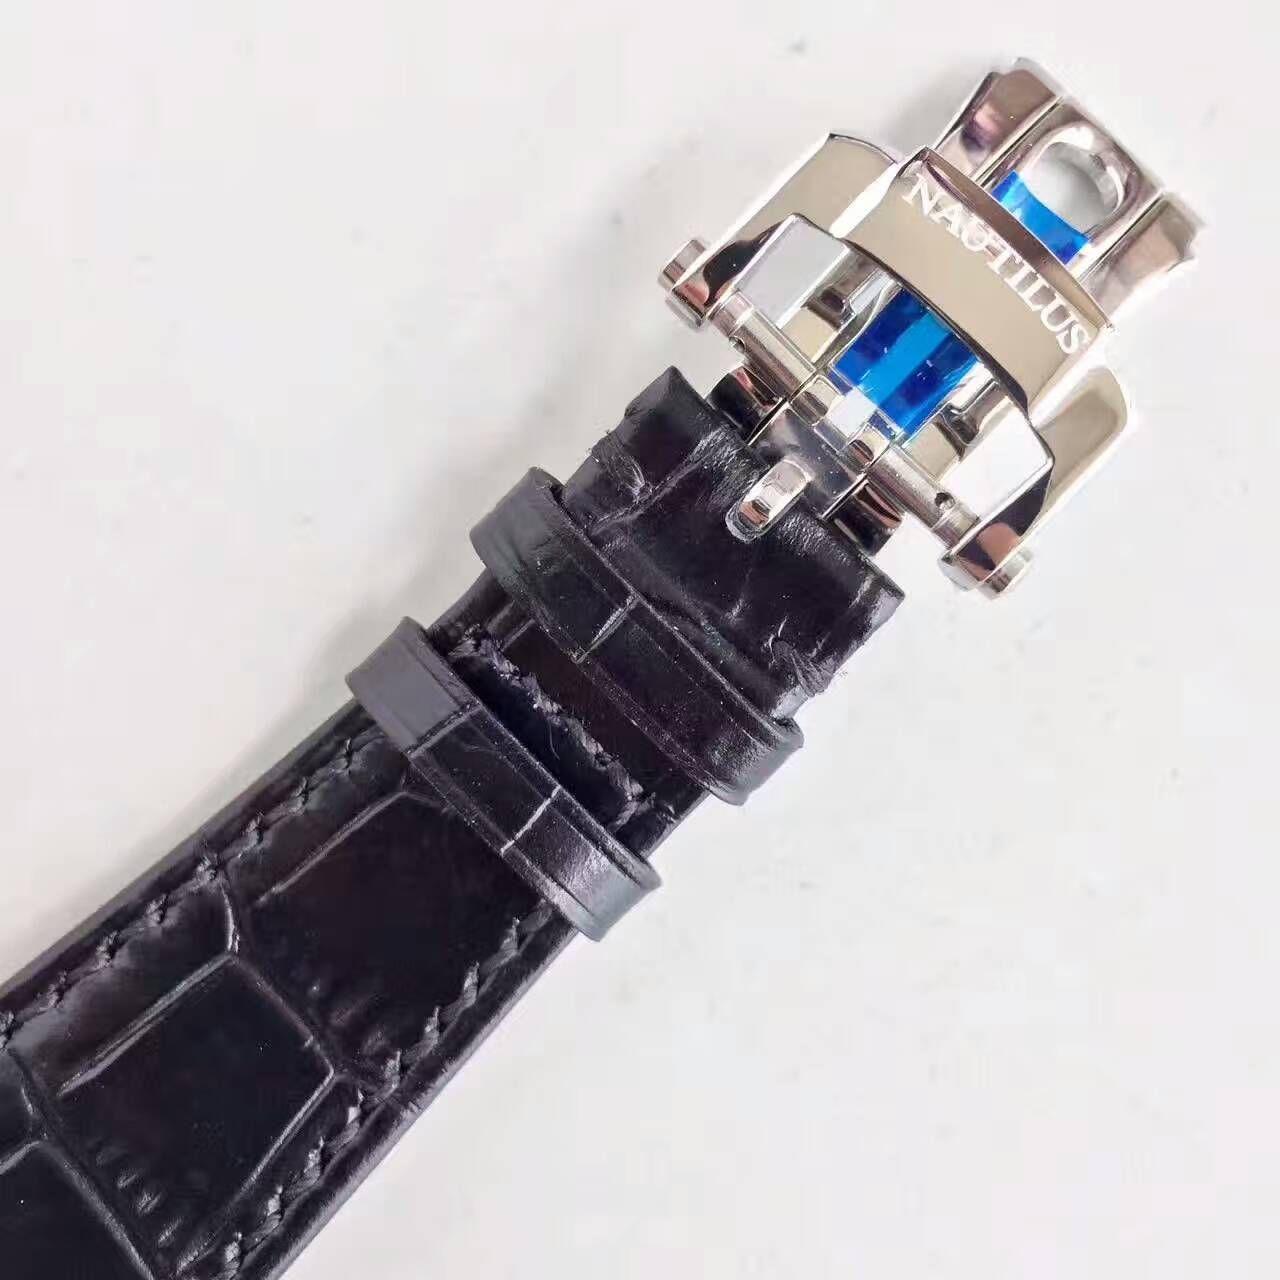 【KM一比一精仿手表】百达翡丽Nautilus系列精钢男表5726A-001